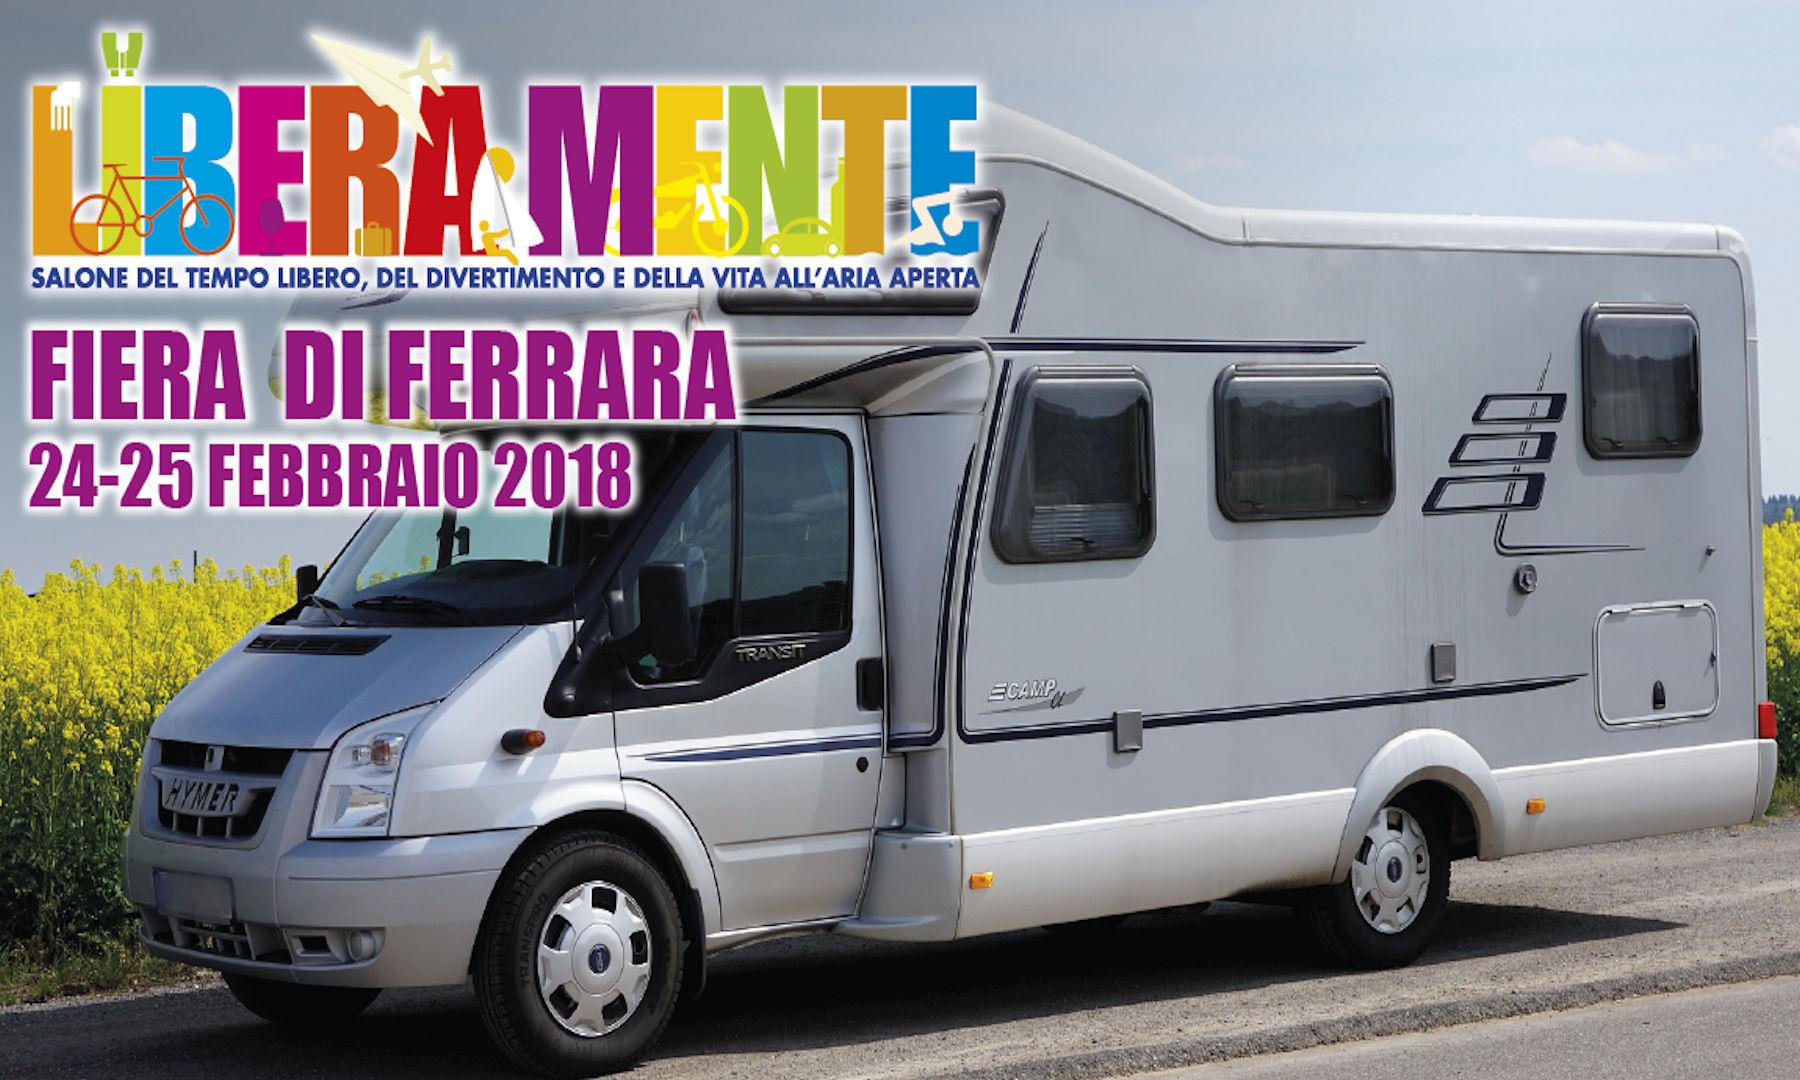 Liberamente – Ferrara 24 e 25 Febbraio 2018